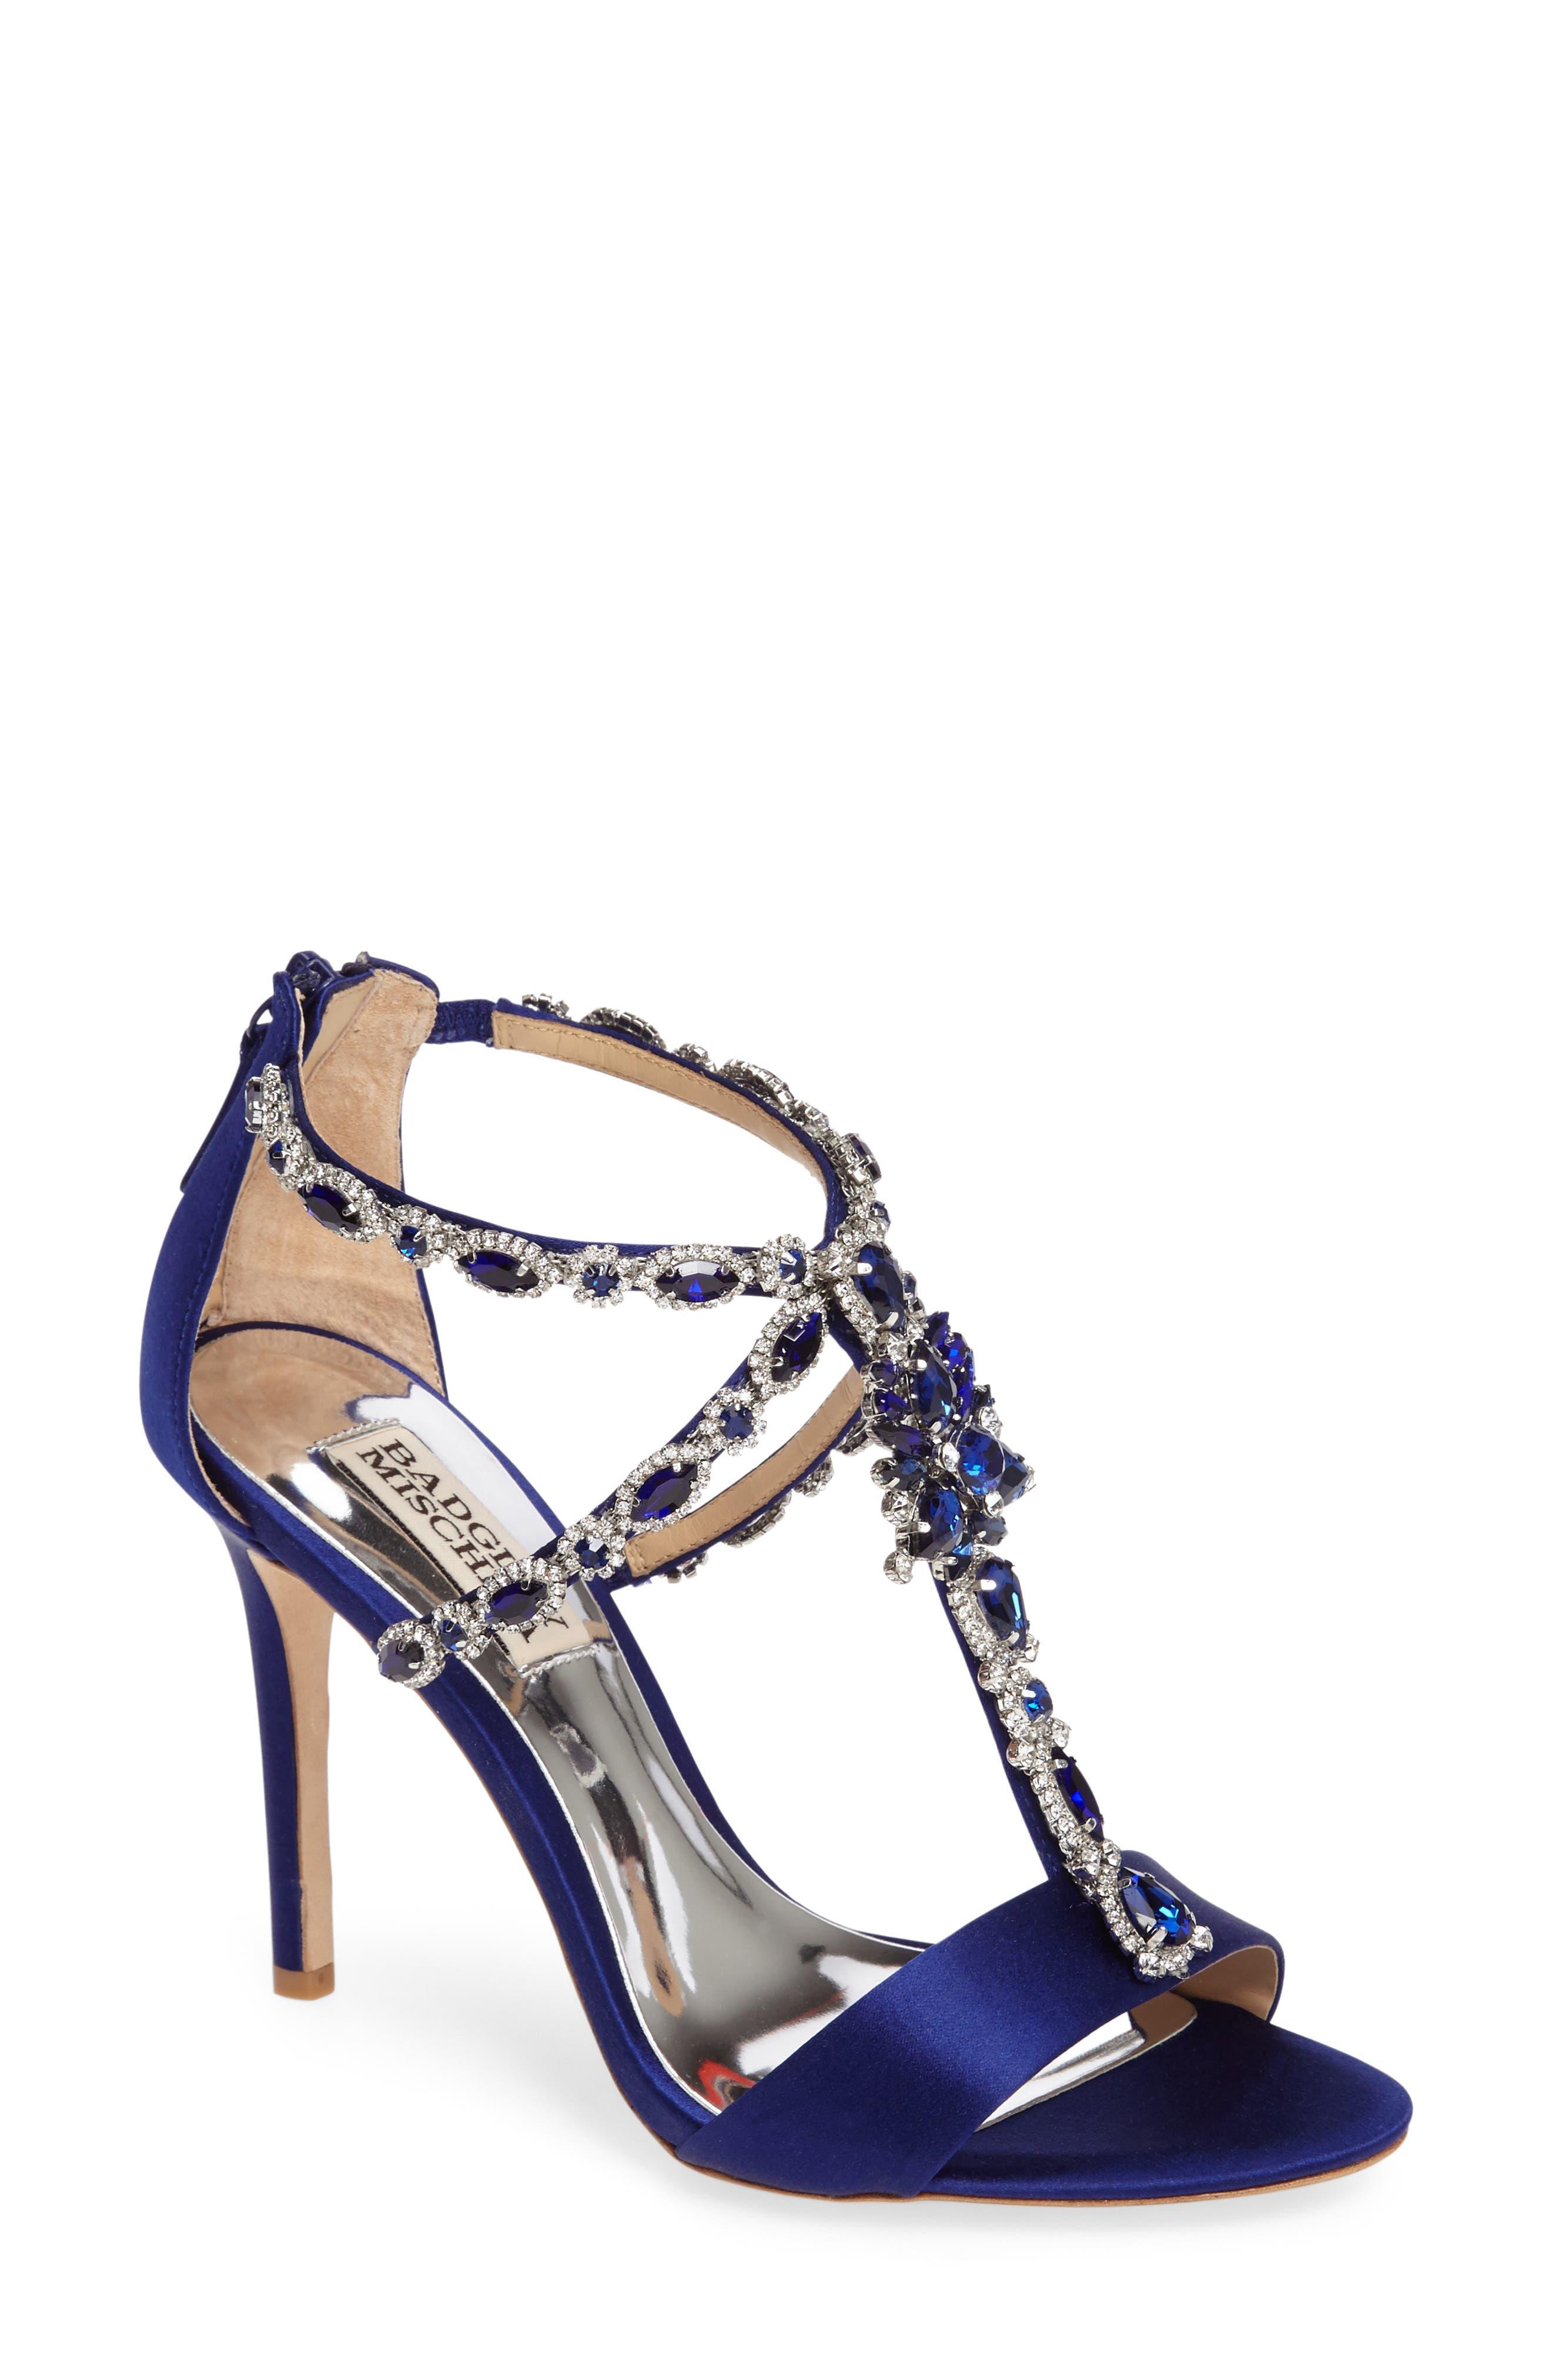 Alternate Image 1 Selected - Badgley Mischka Georgia Crystal Embellished T-Strap Sandal (Women)